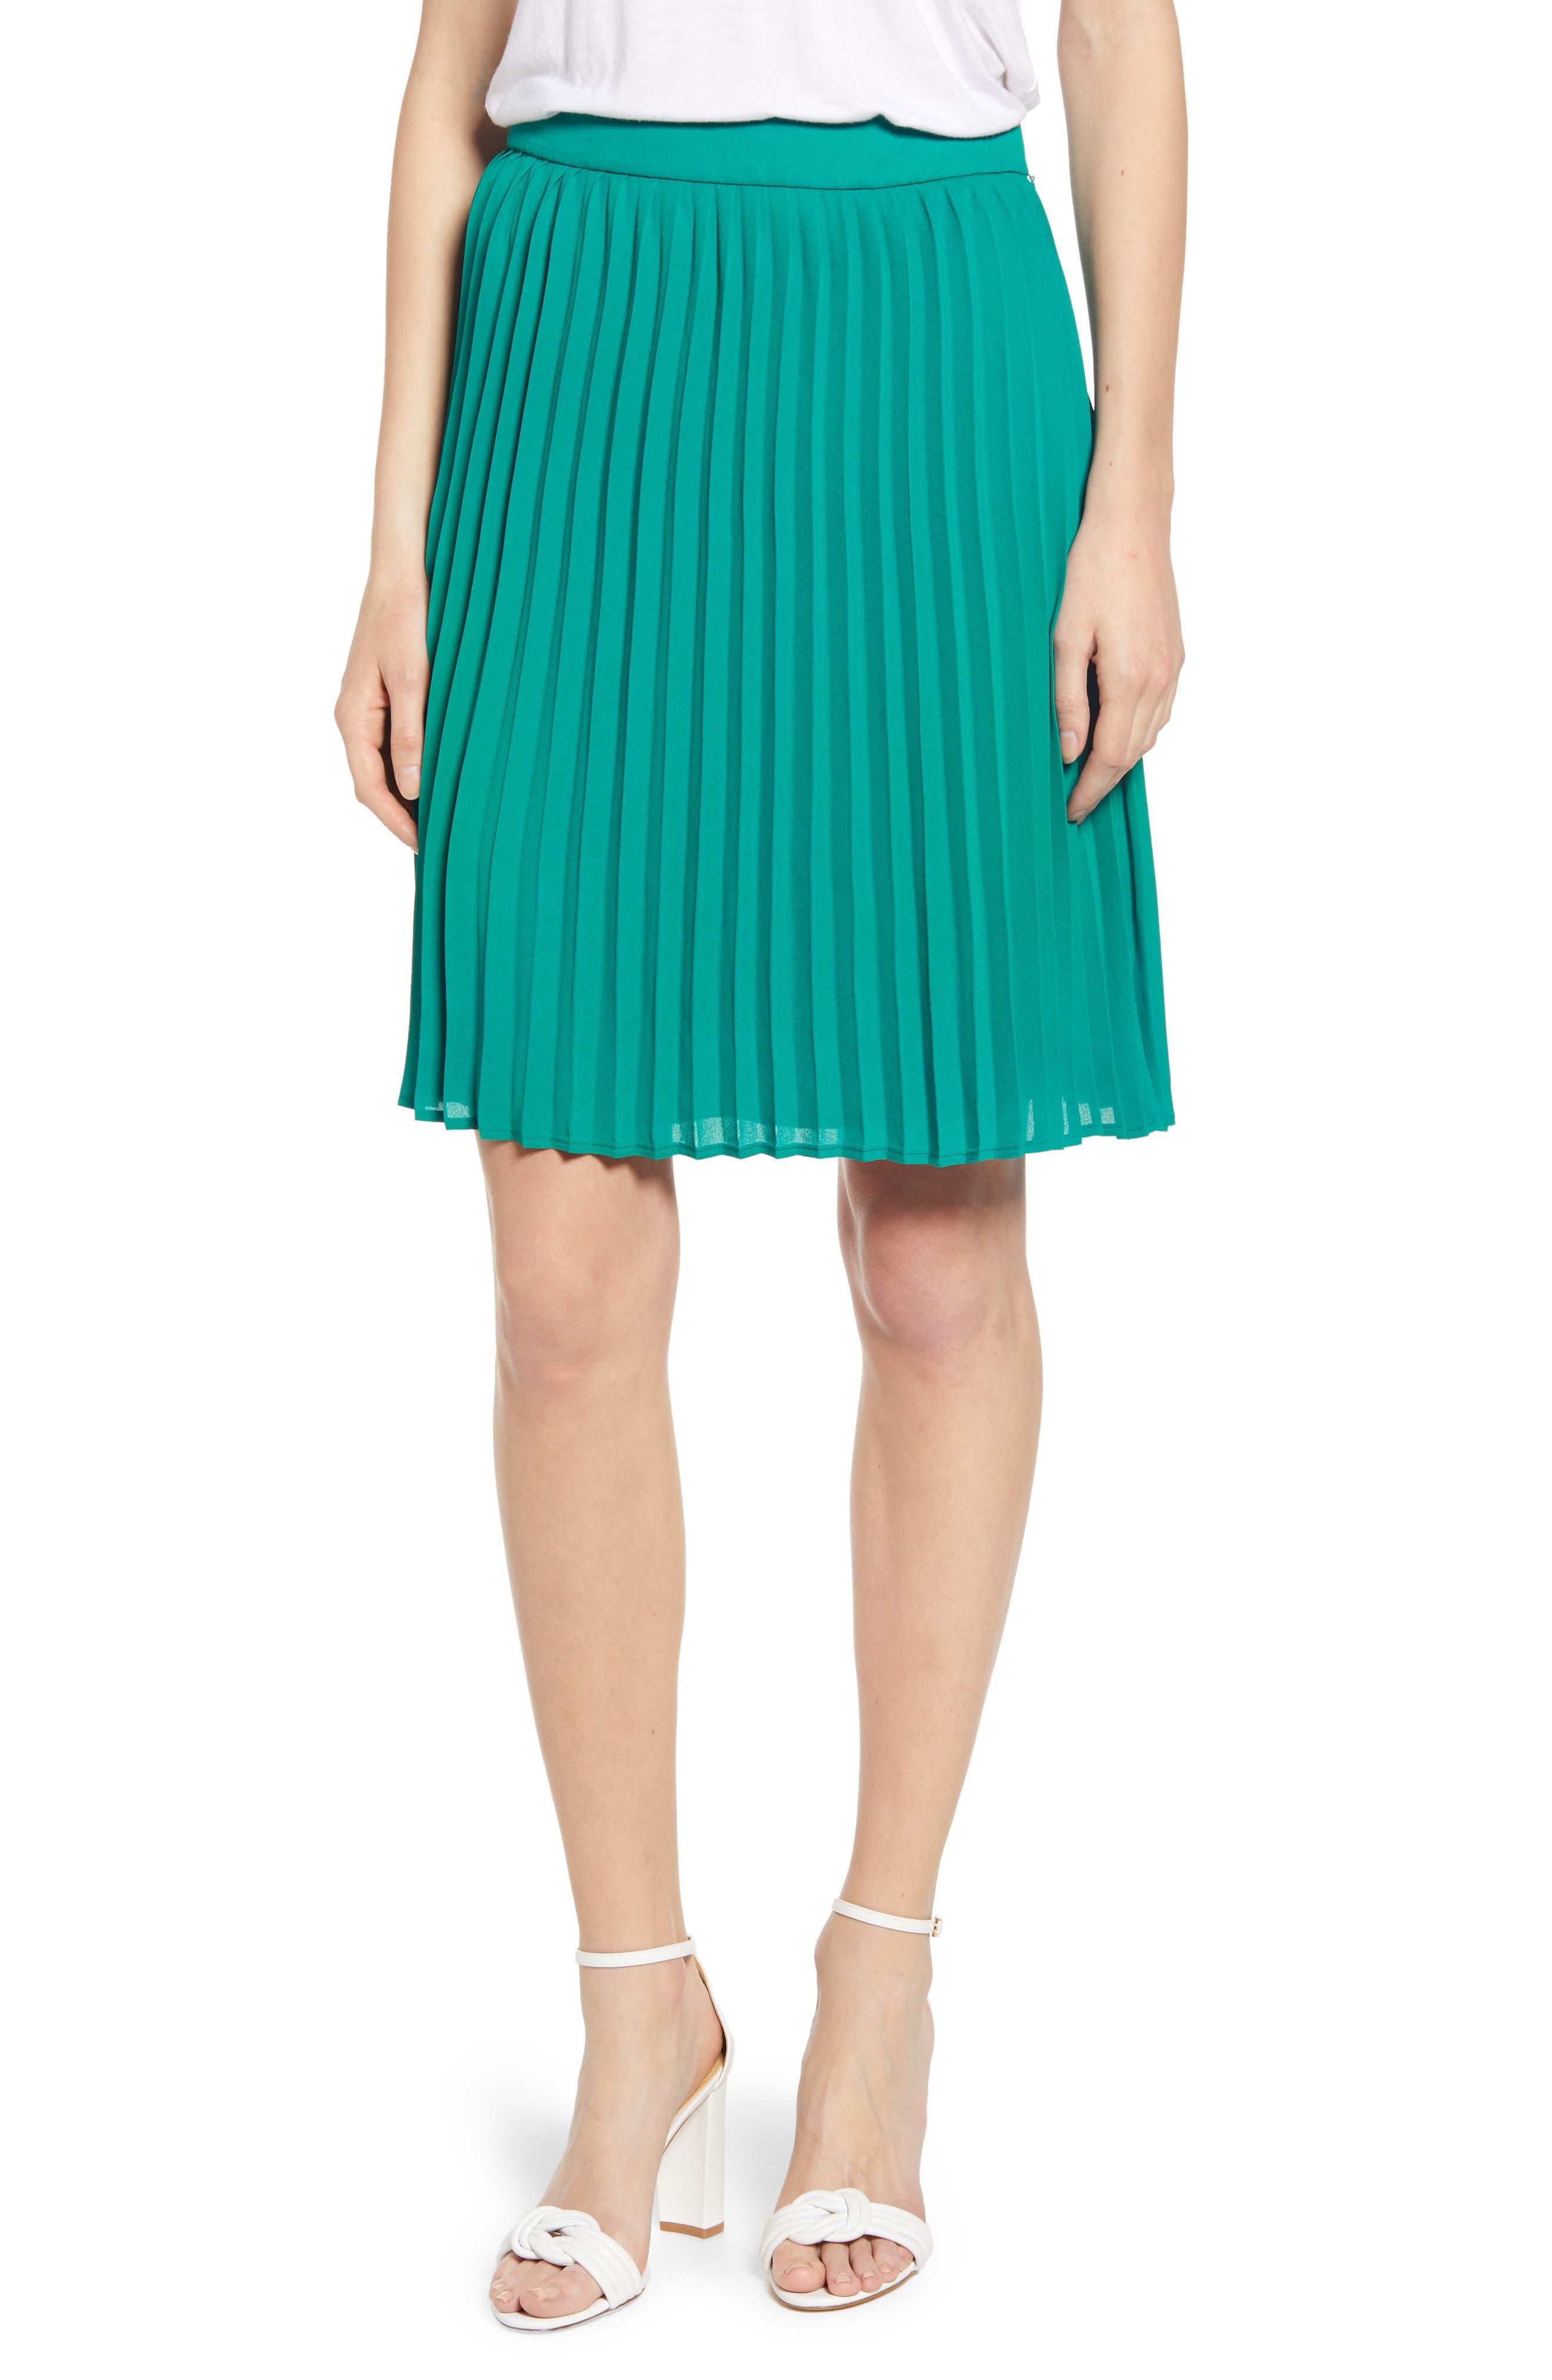 GIBSON, x International Women's Day Thamarr Pleated Skirt, Main thumbnail 1, color, GREEN